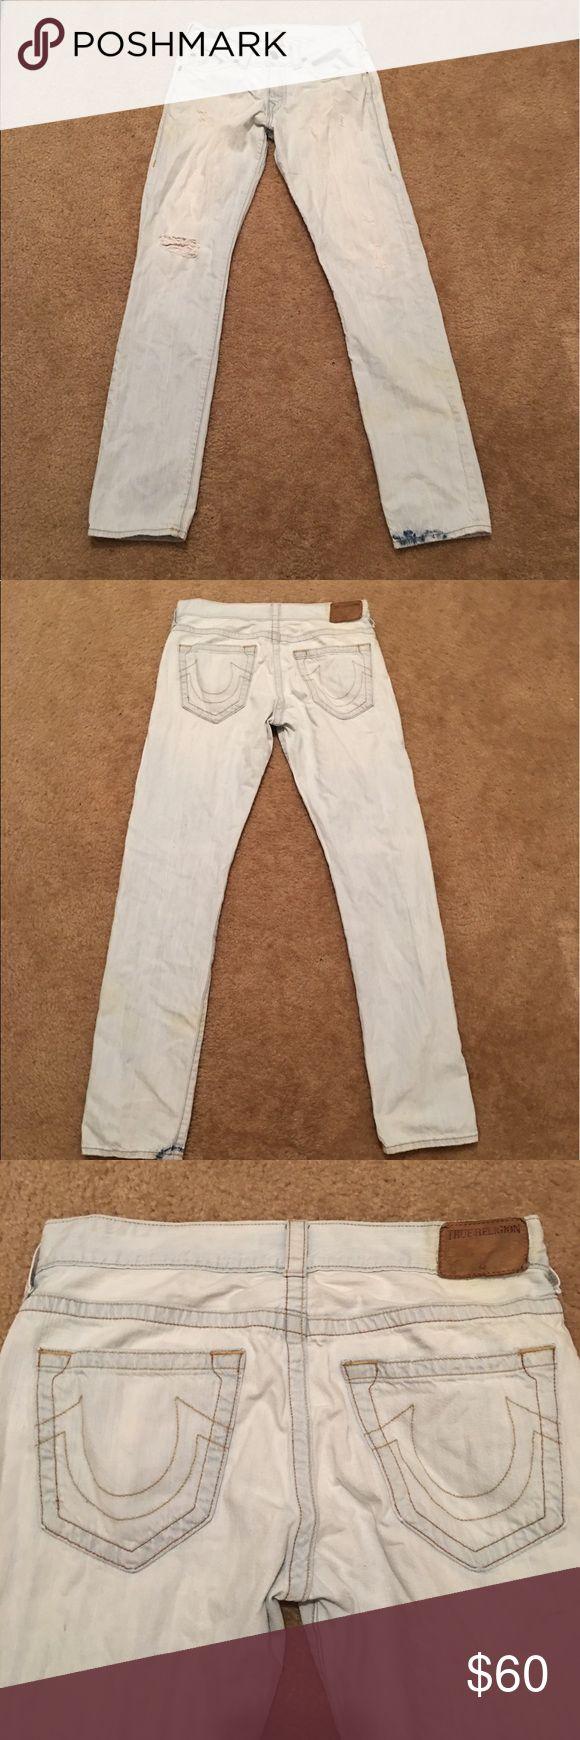 True religion men jeans 31 /32 waist 31 geno true religion jeans/ pants True Religion Jeans Straight